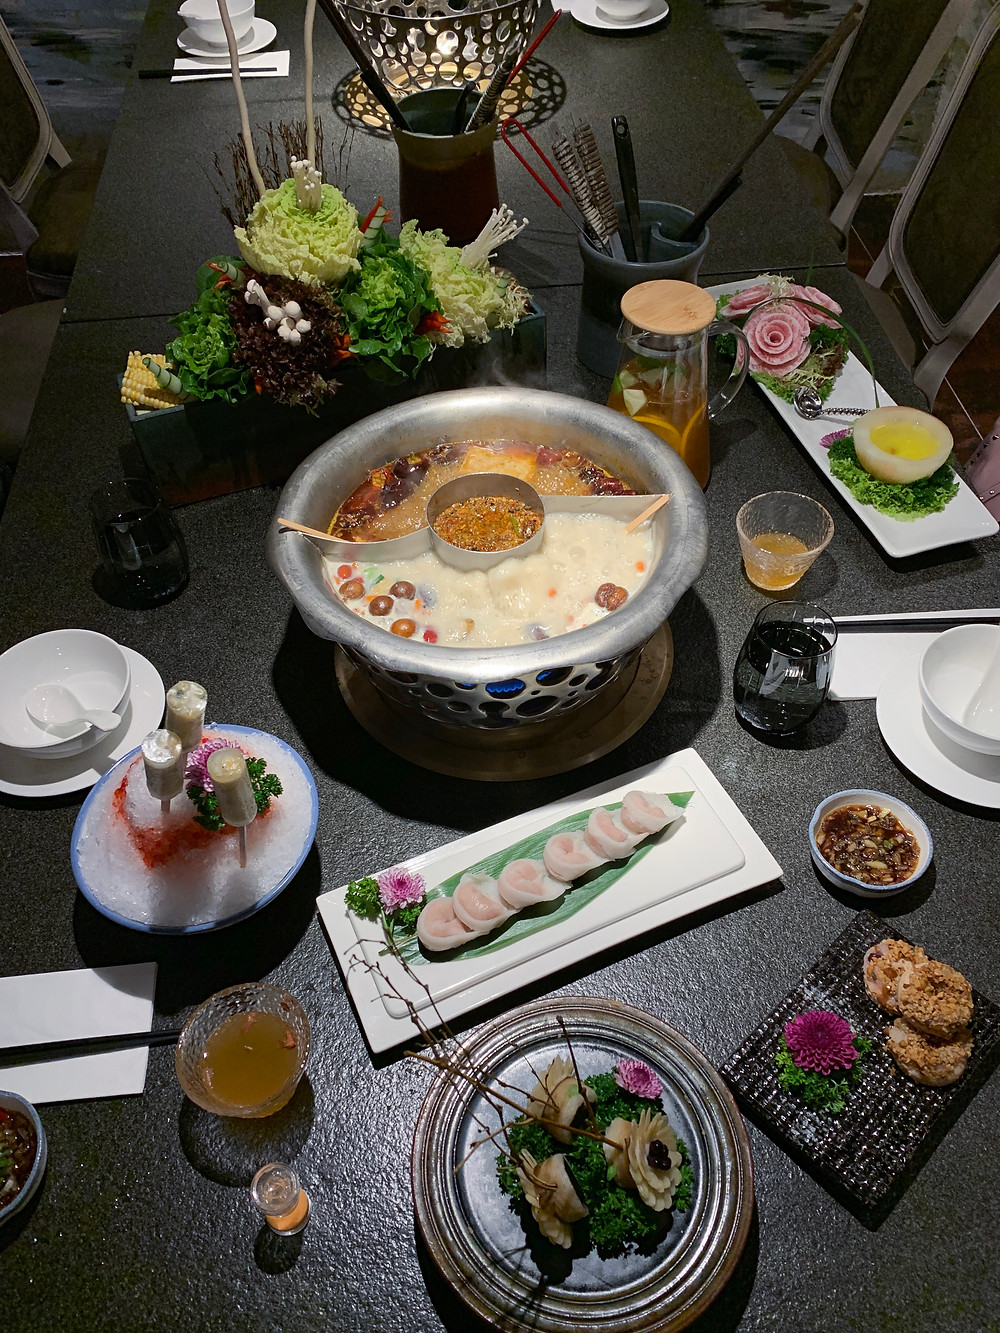 Food at Quan Alley hot pot restaurant in Hong Kong